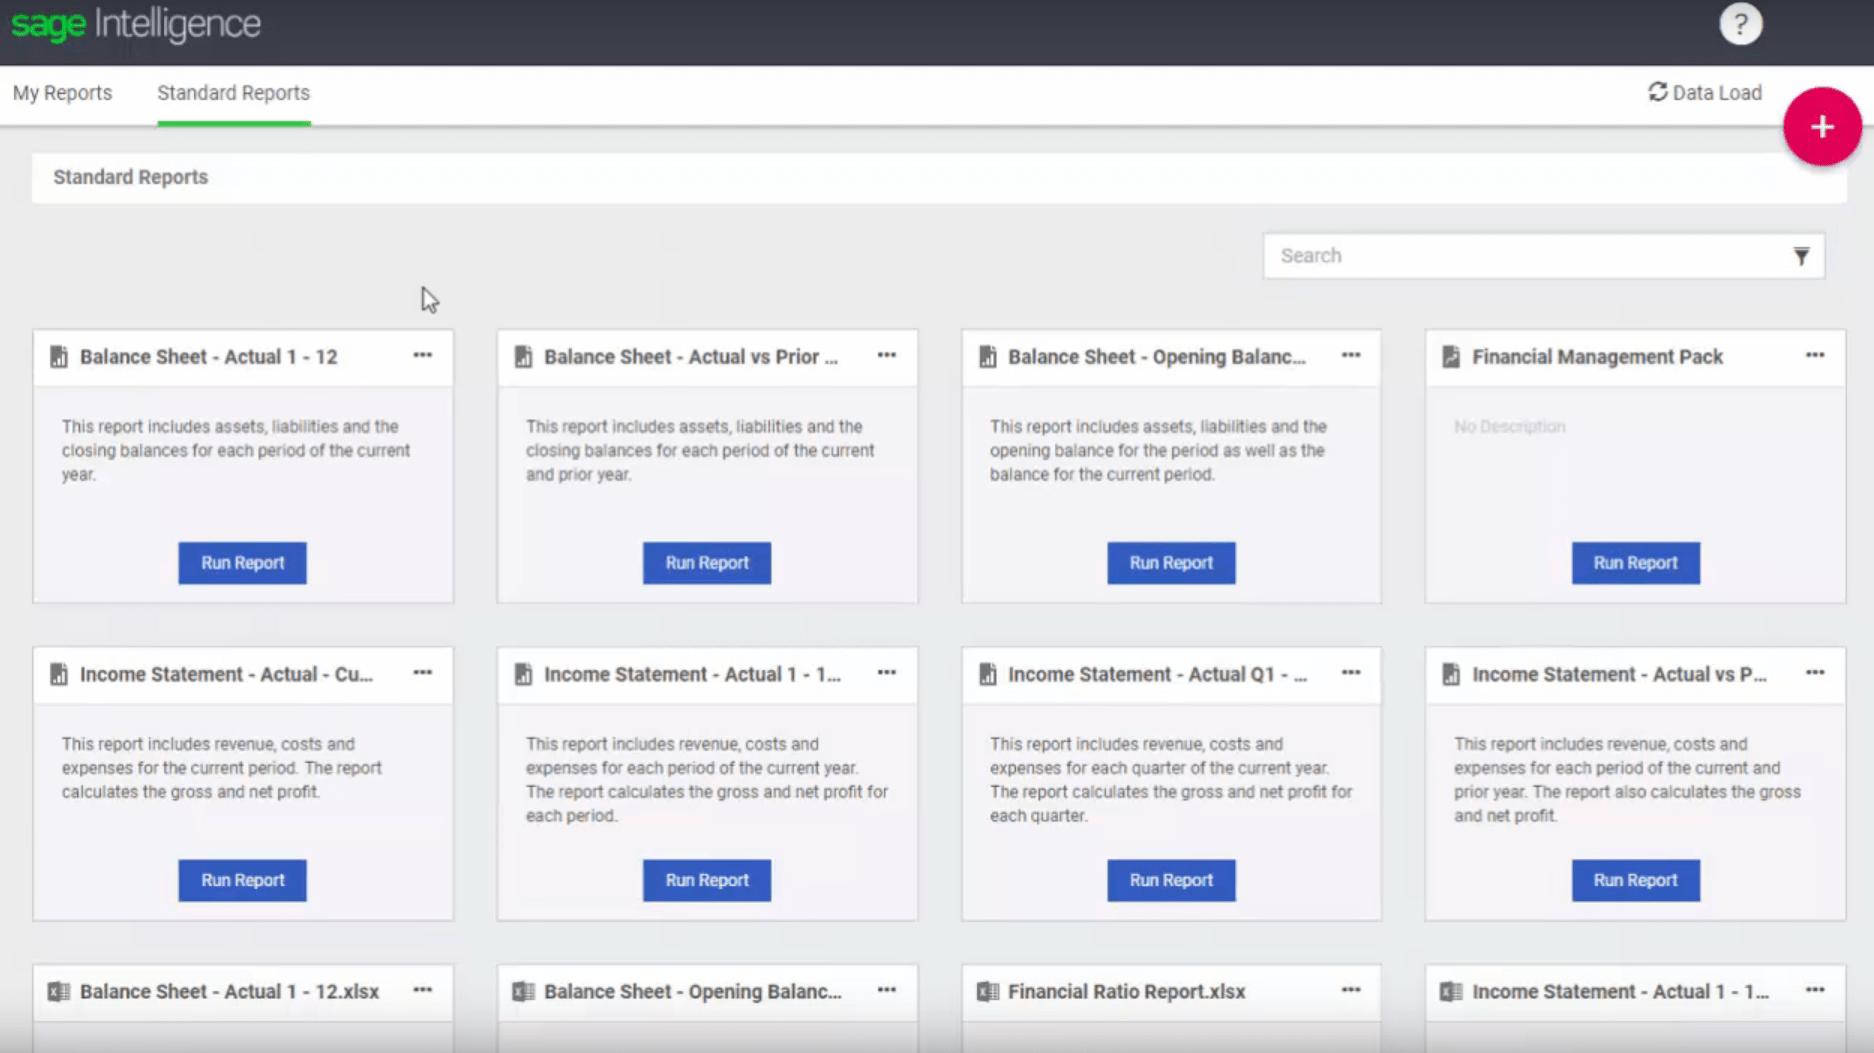 Sage Intelligence Reporting | BI Tools | 2019 Software Reviews